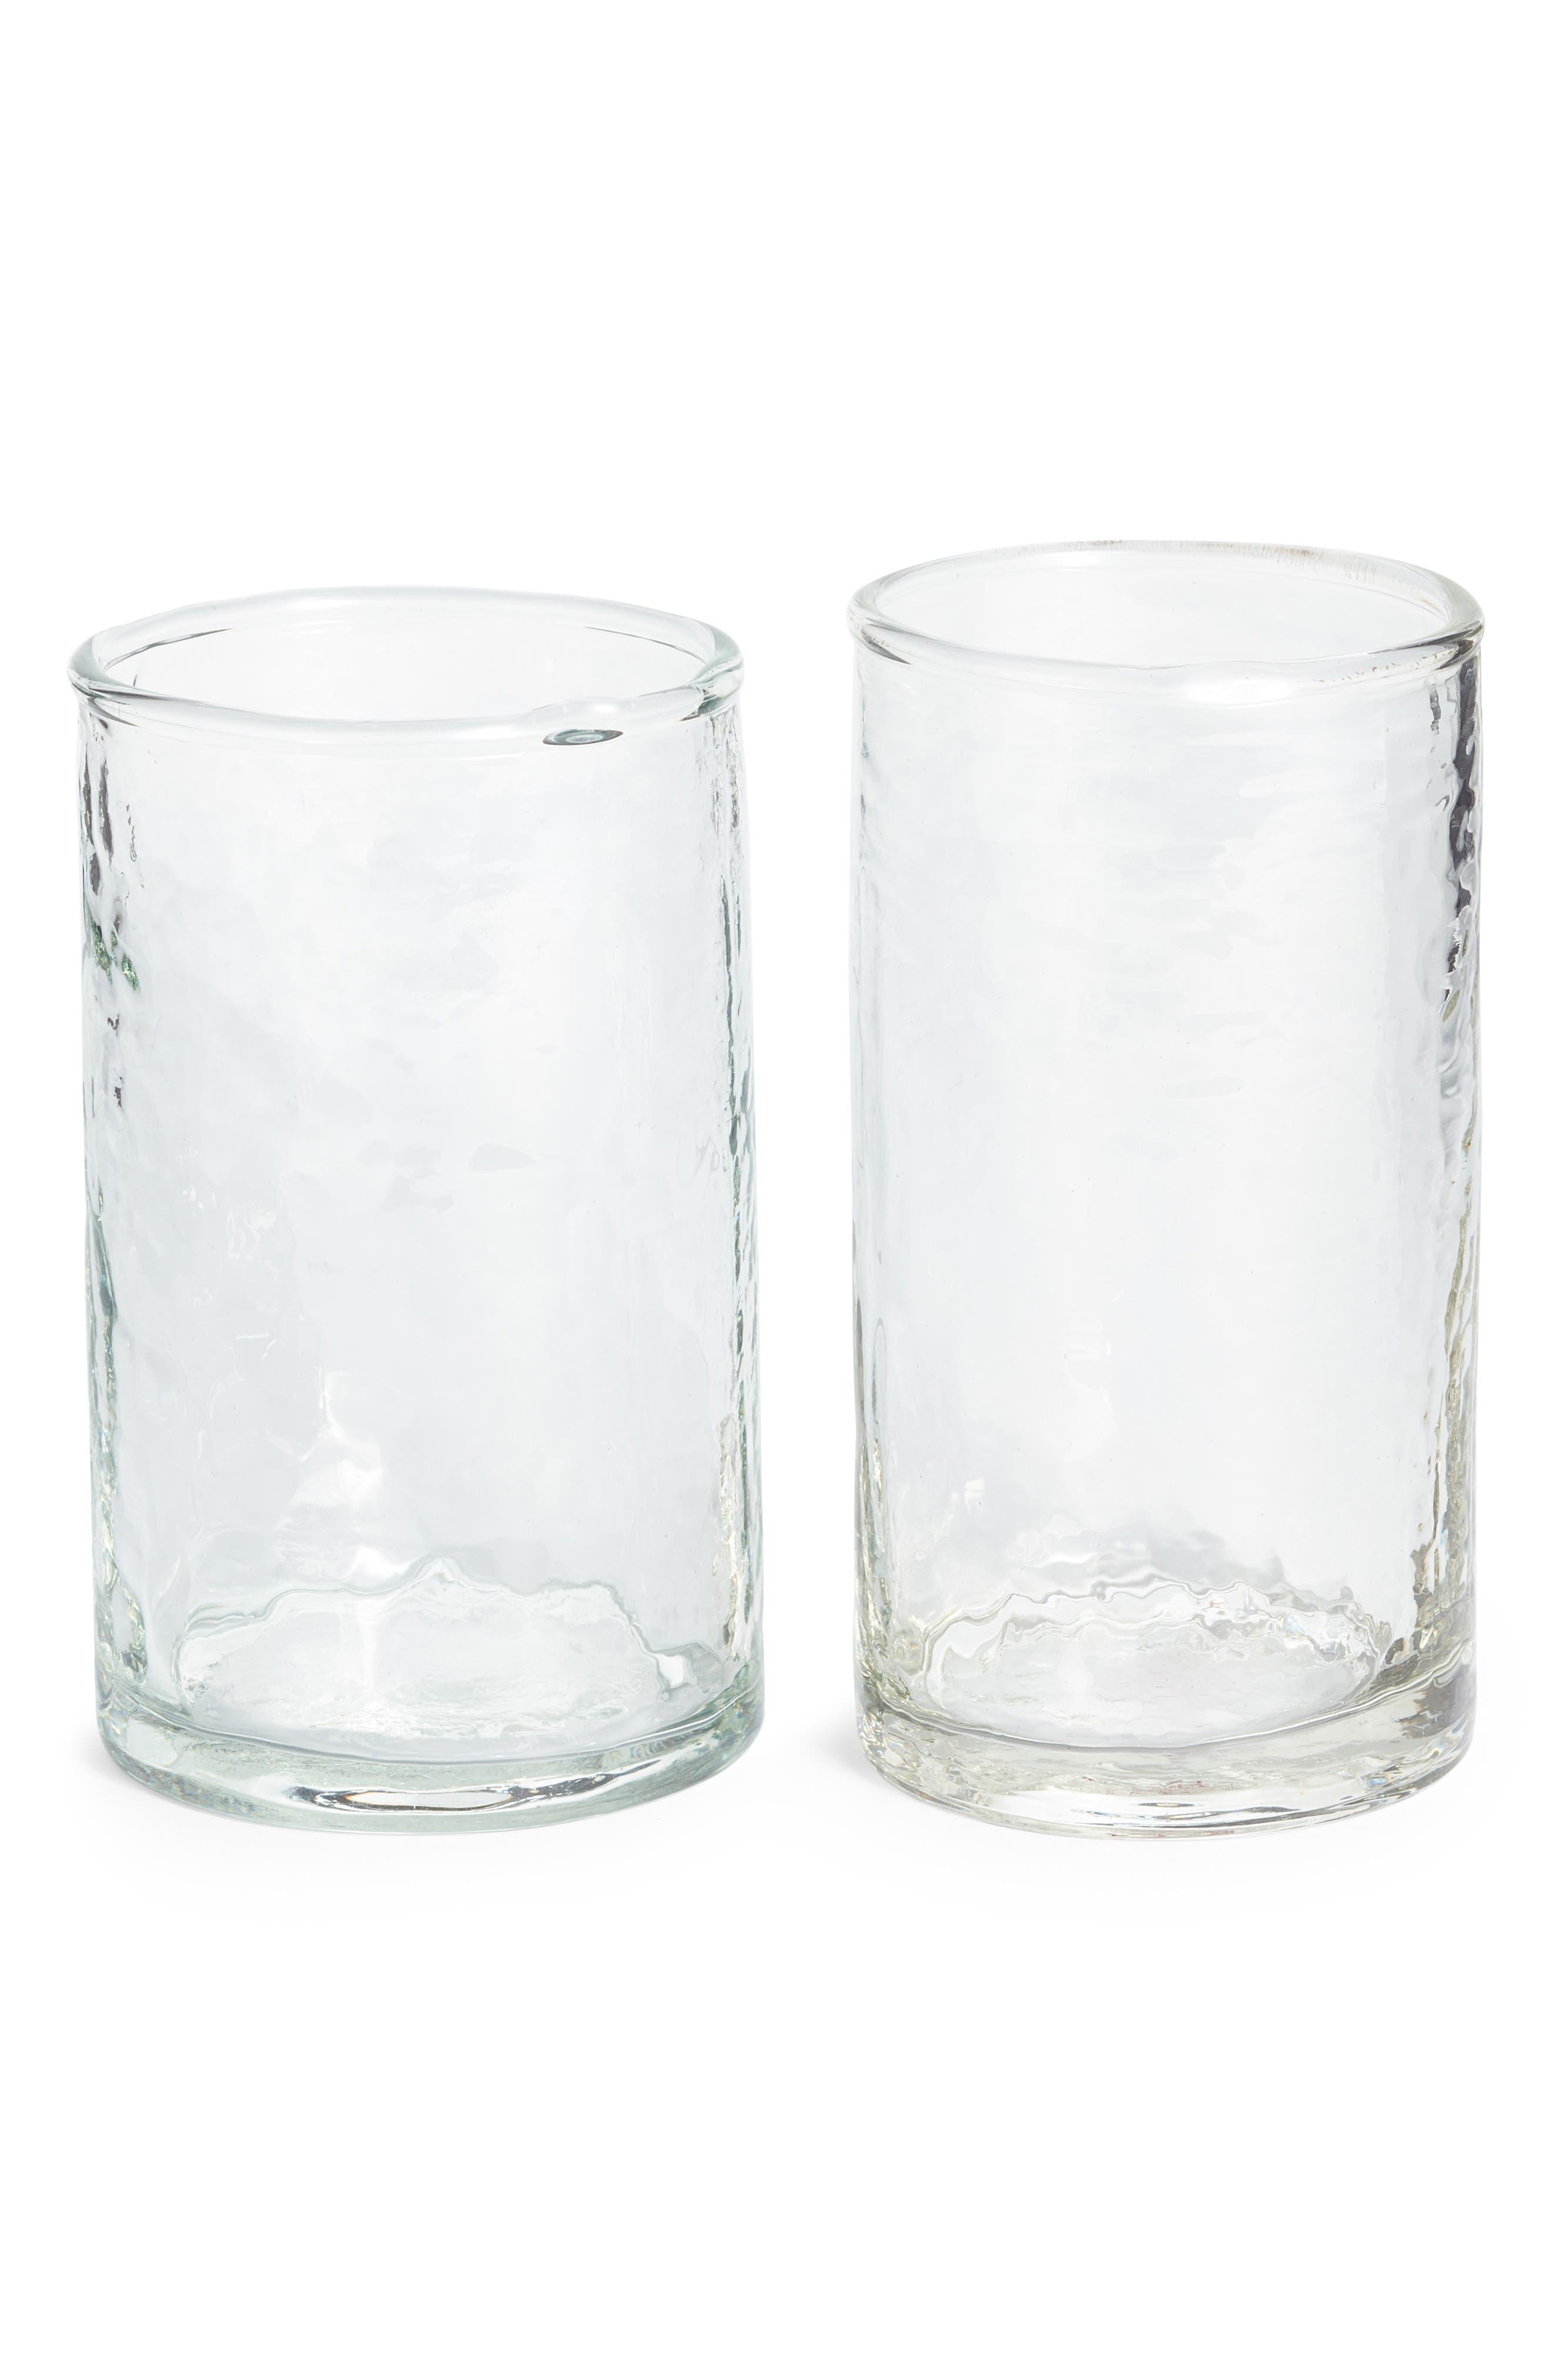 Alternate Image 1 Selected - Treasure & Bond Set of Two Hammered Short Glasses